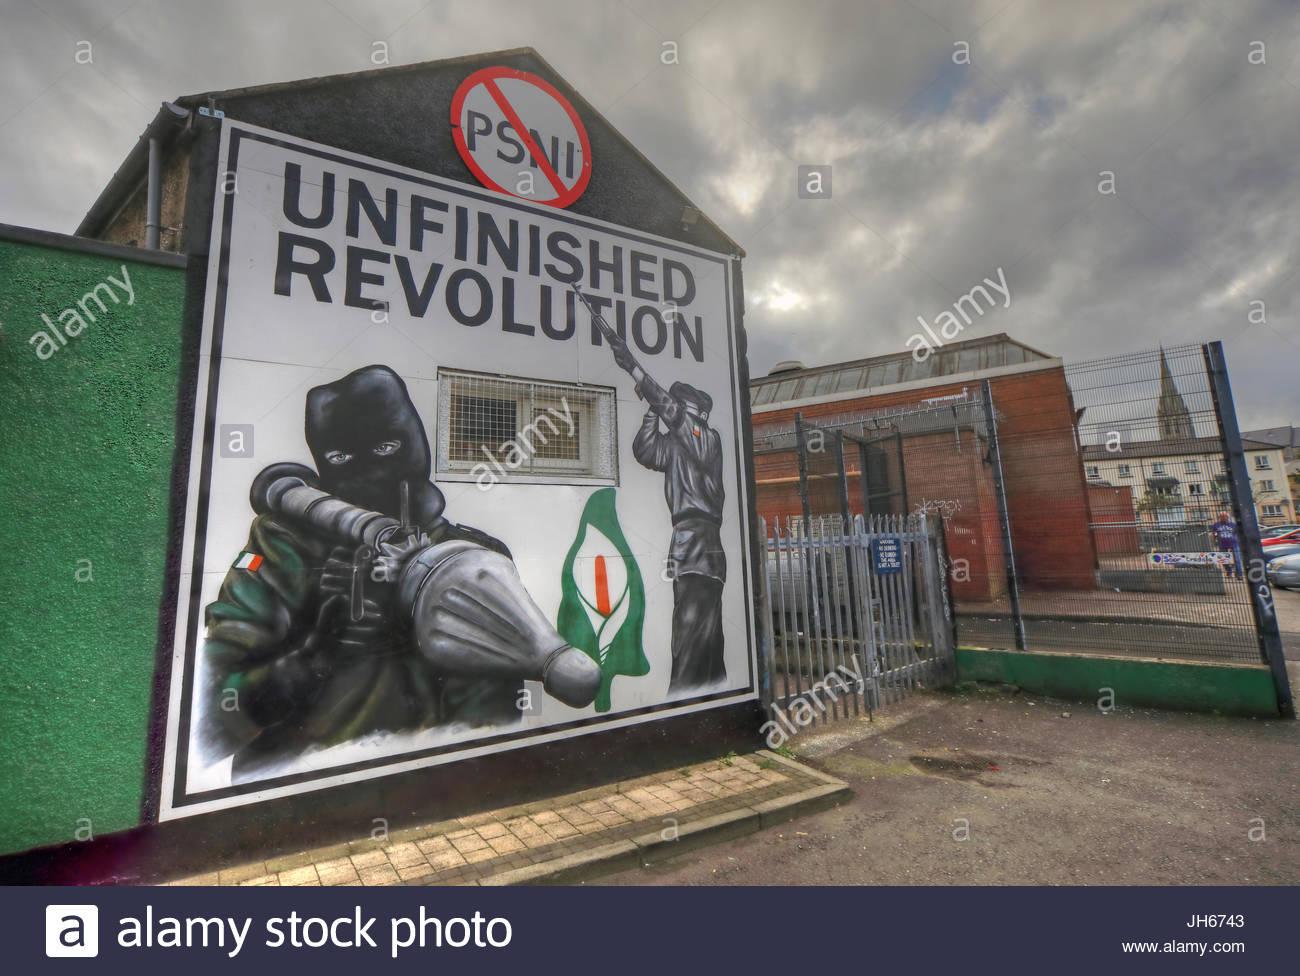 Irish,Bogside,Troubles,Political,NorthernIreland,tourist,Tourism,Struggle,DerryCity,Peace,Art,Culture,violence,fighter,painting,Bogside Mural,Bogsidemural,colour,gotonysmith,Sunday Bloody Sunday,SundayBloodySunday,Unfinished Revolution,Revolution